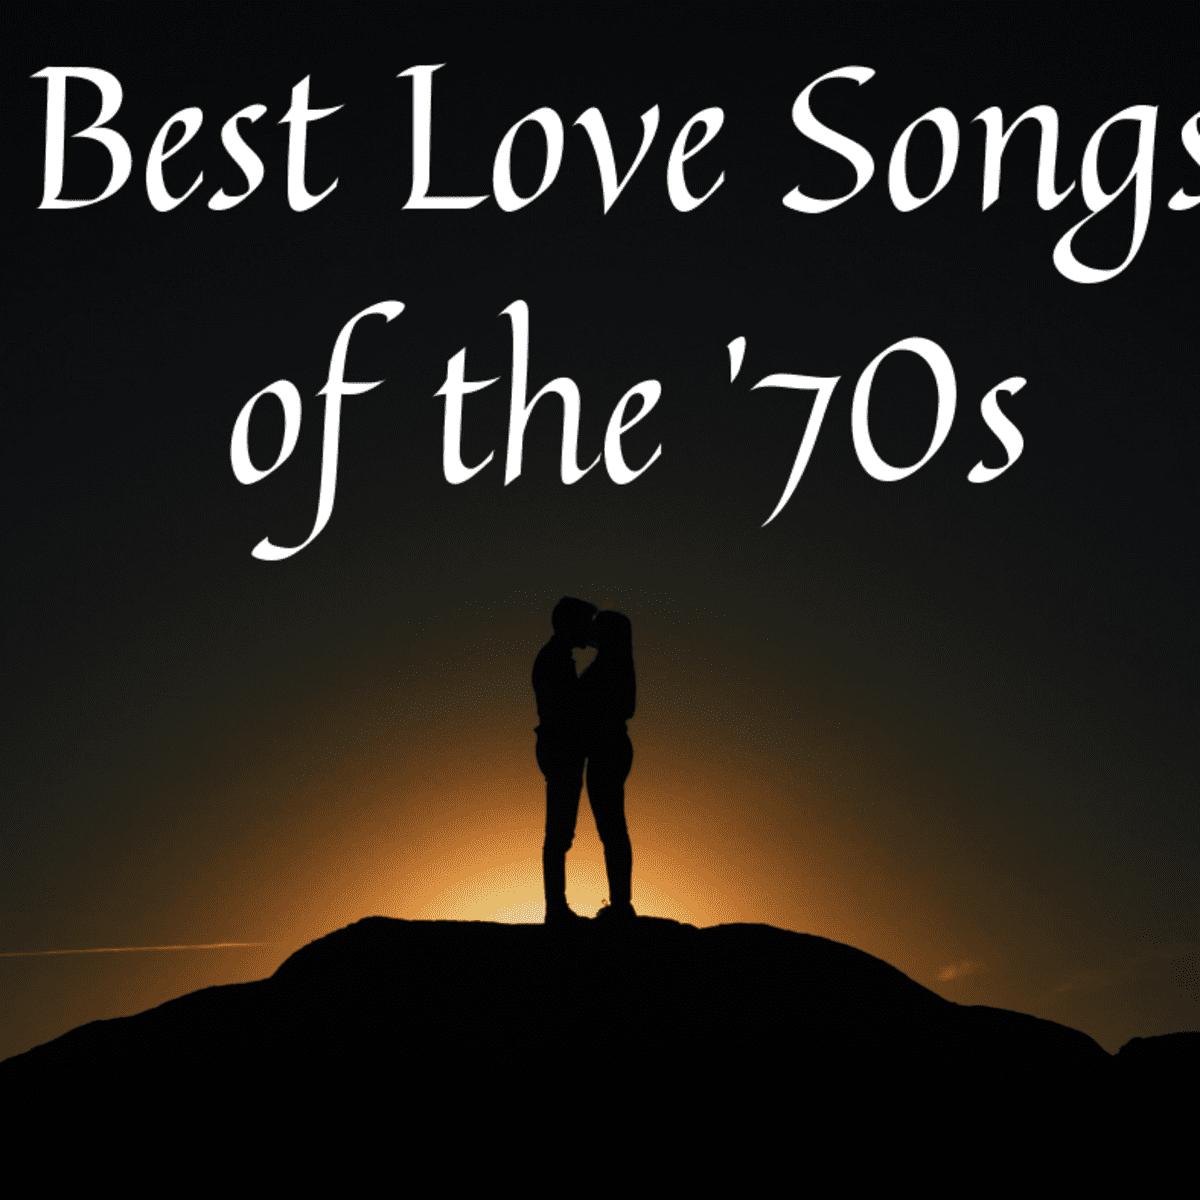 Best songs for love